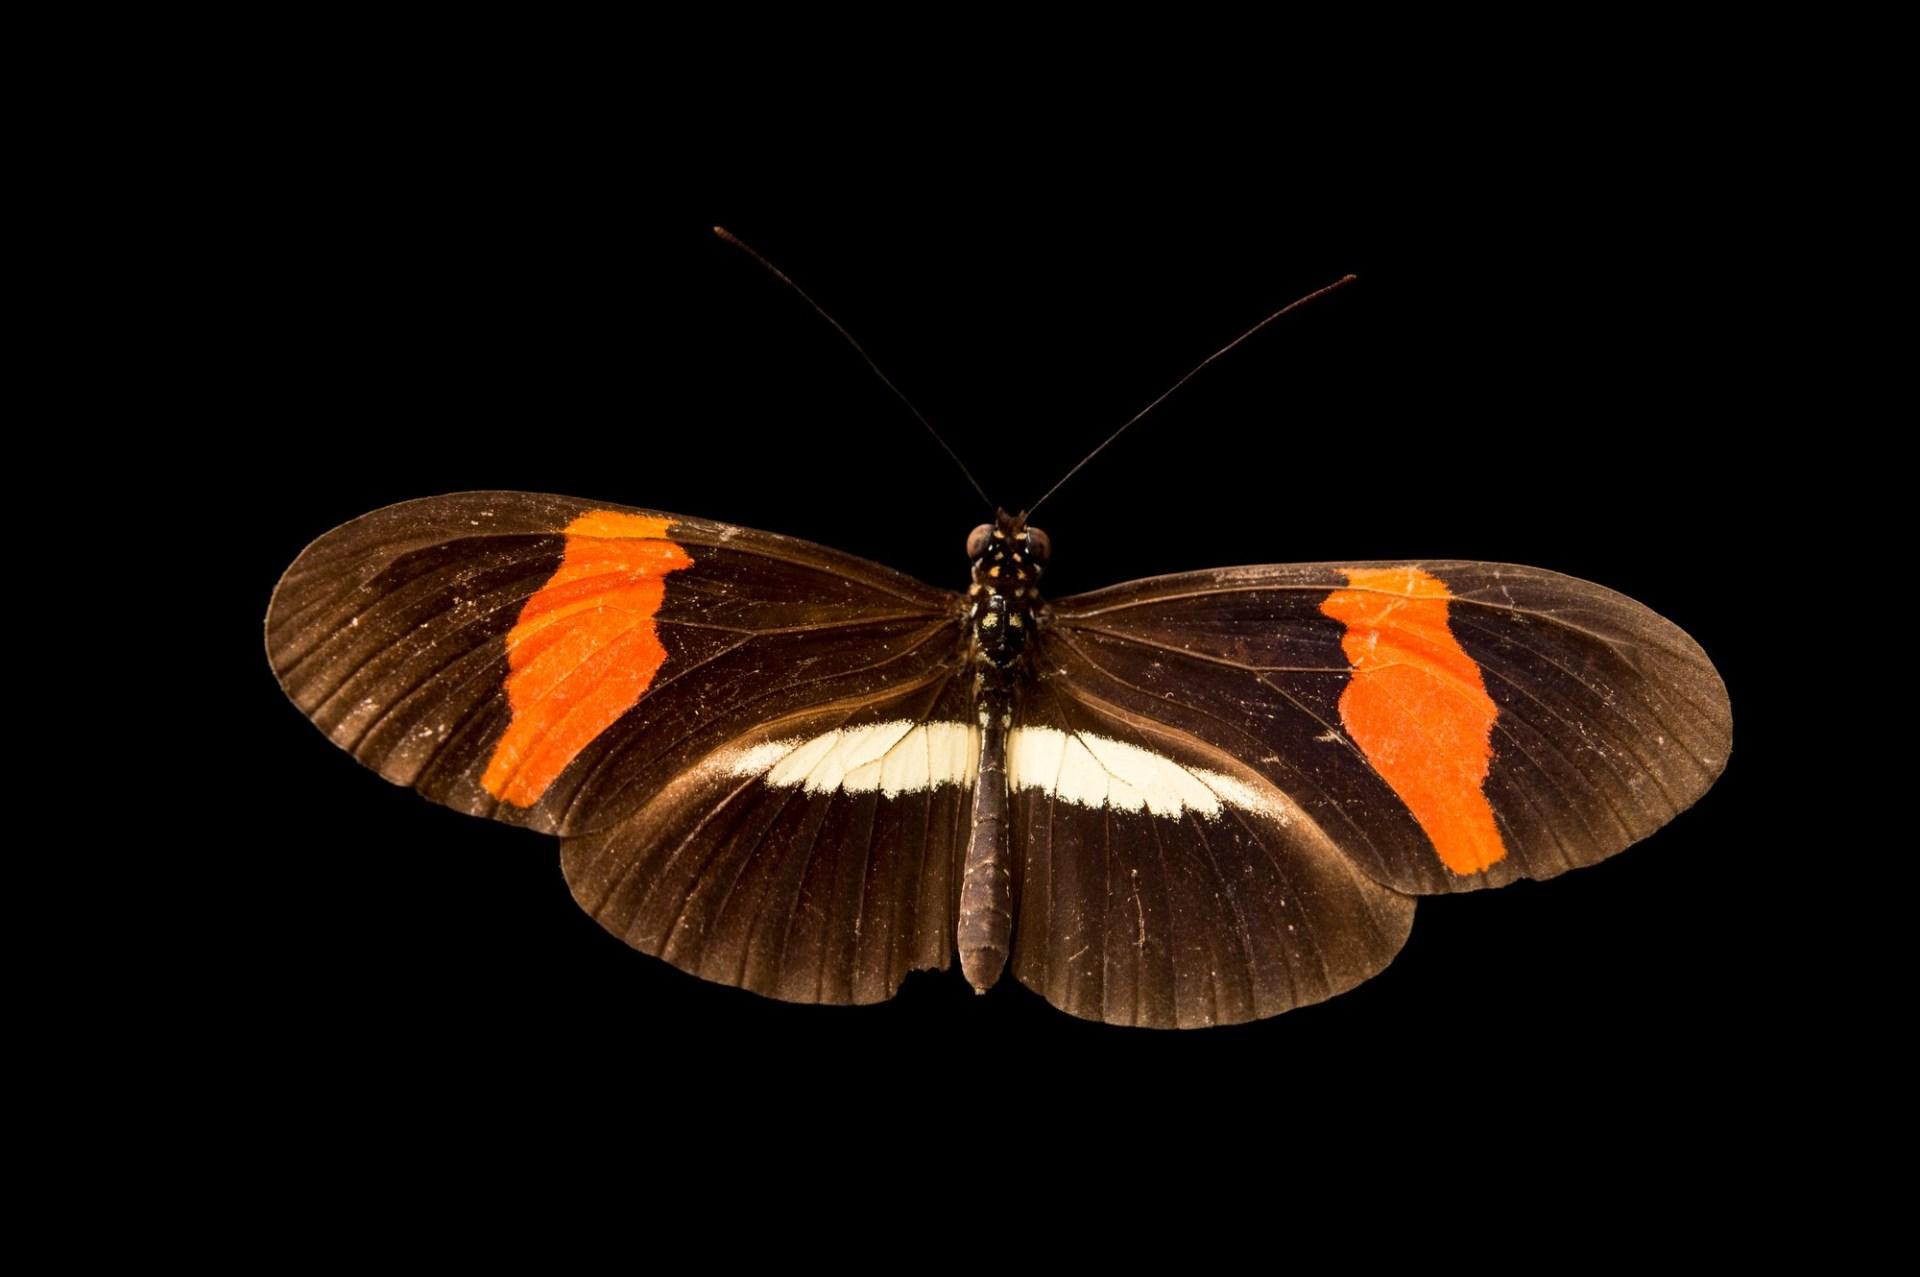 Photo: Red postman butterfly (Heliconius erato petiverana) in Gamboa, Panama.